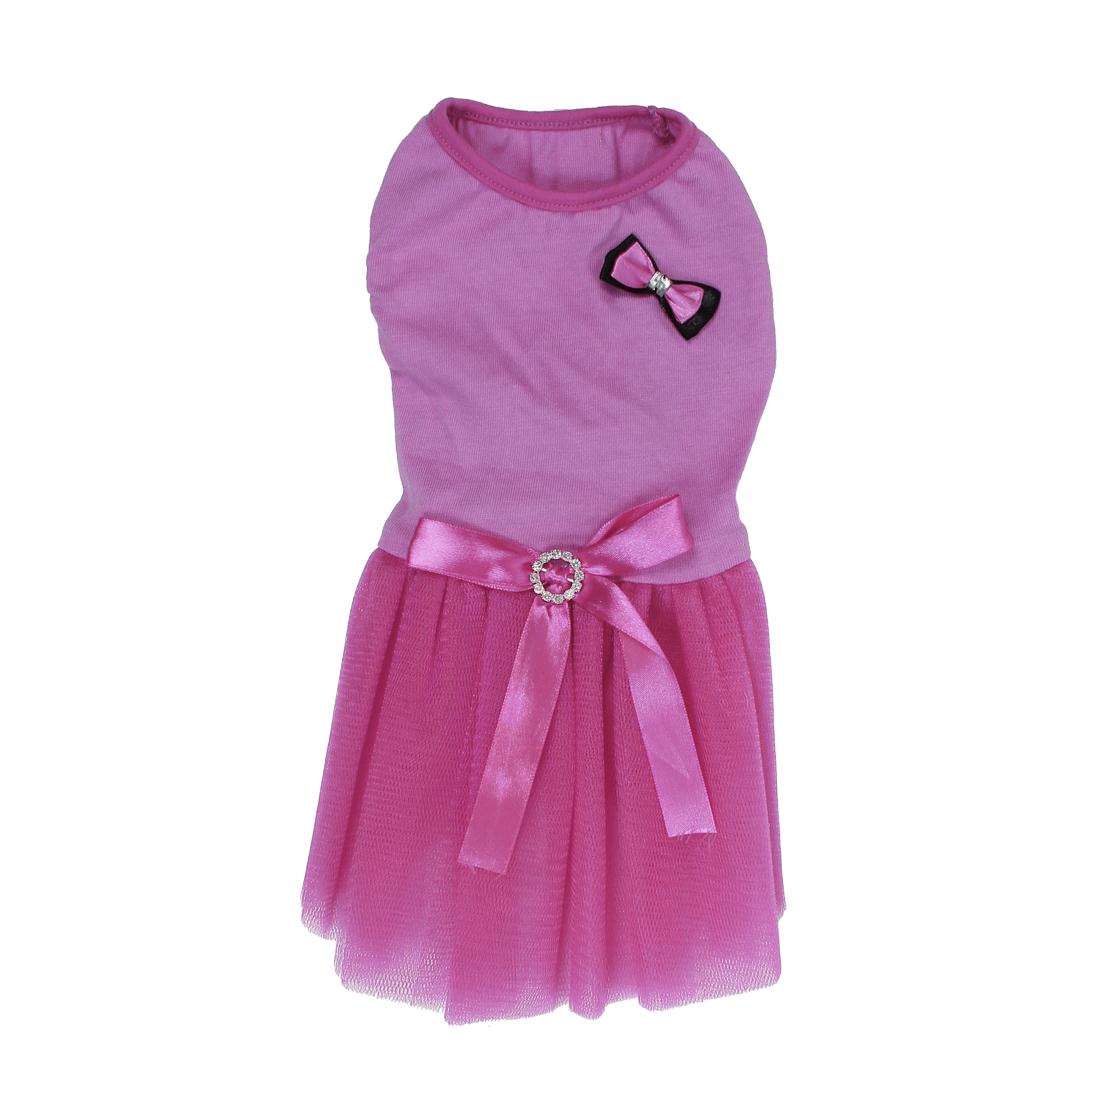 Pet Dog Doggie Bowknot Decor Summer Ballet Meshy Dress Skirt Pink Size L